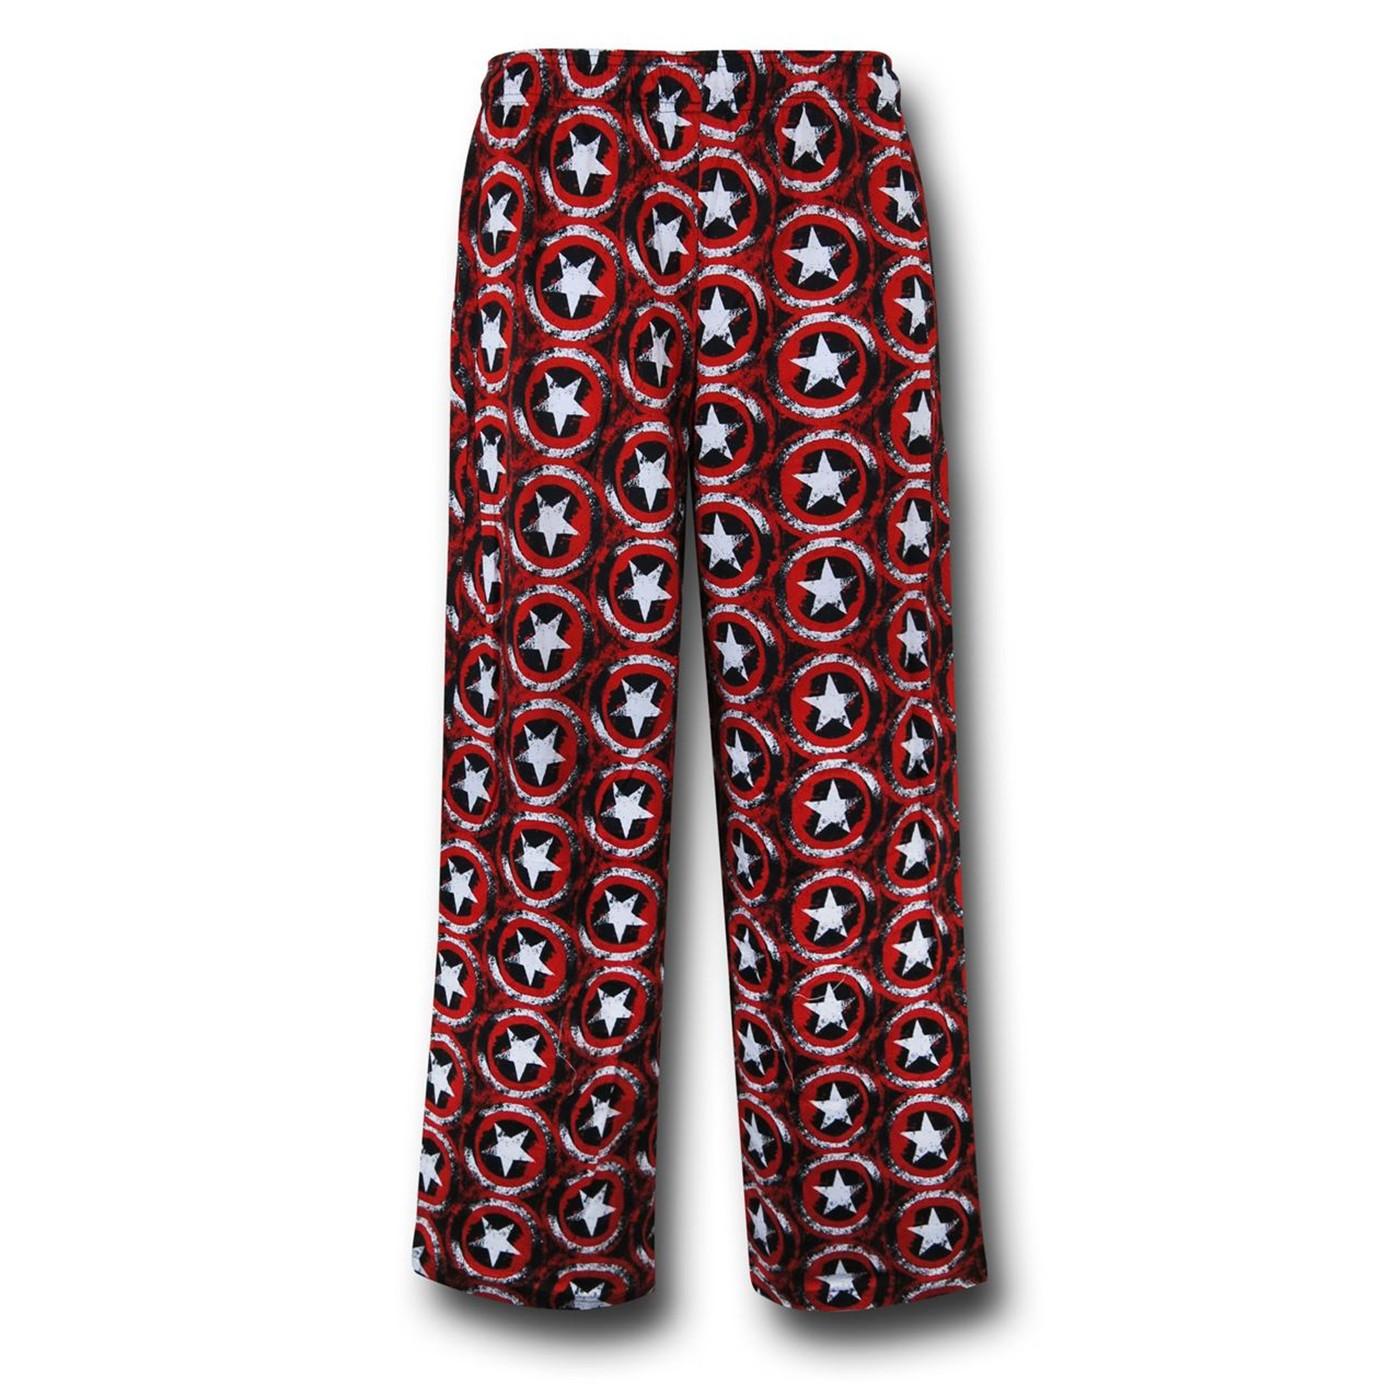 Captain America Shields All-Over Men's Pajama Pants